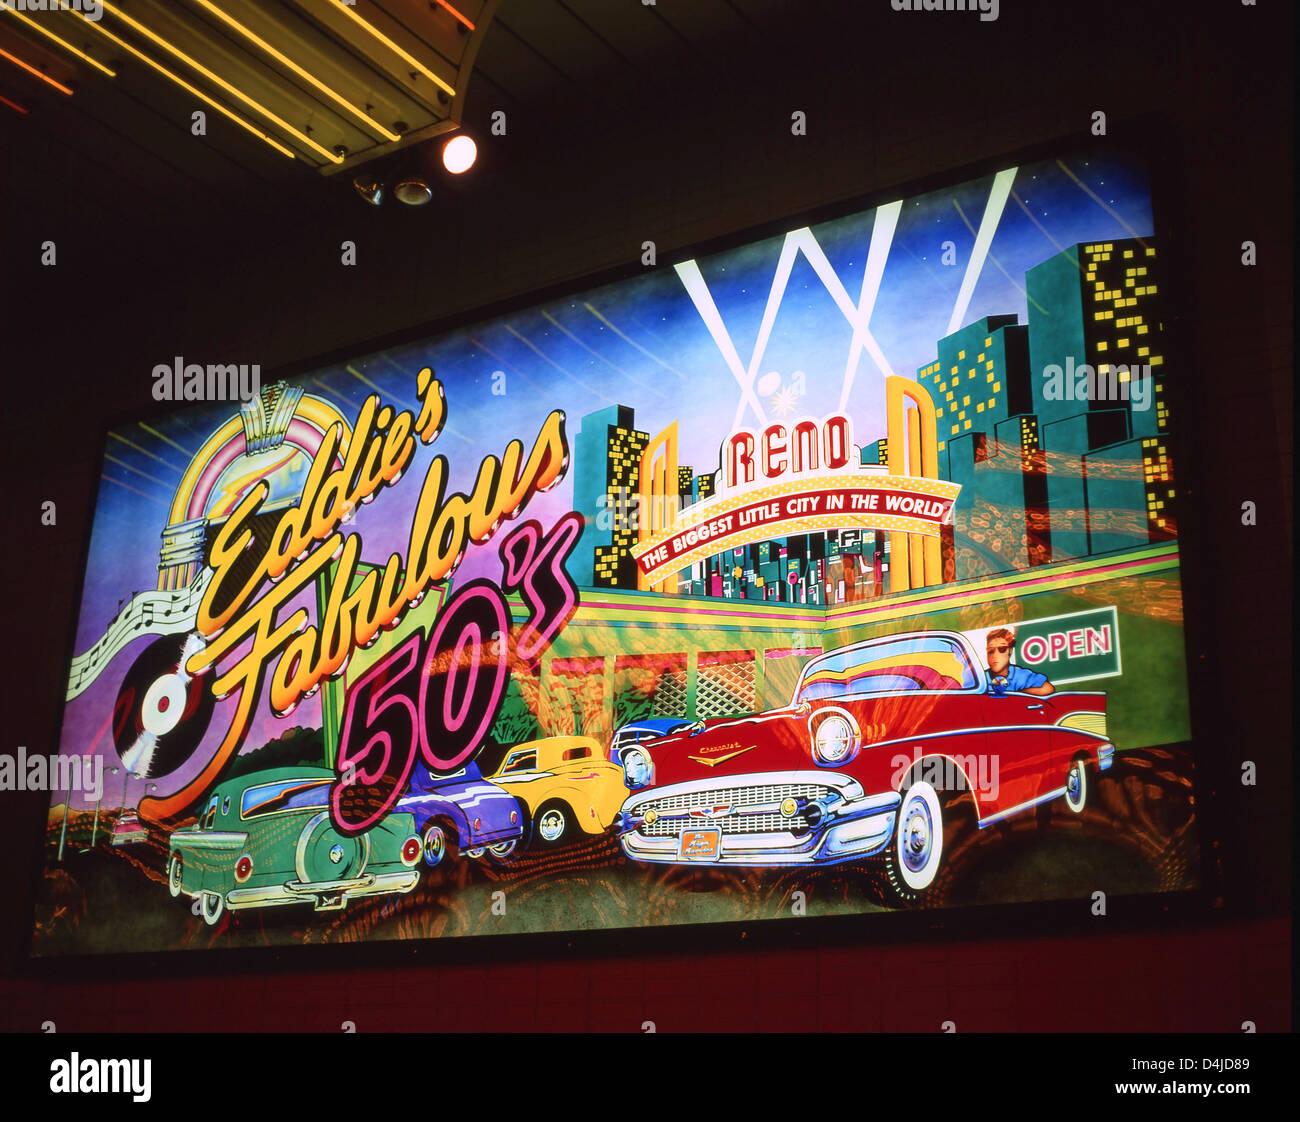 Eddie's Fabulous 50's Casino illuminated sign, Reno, Nevada, United States of America - Stock Image